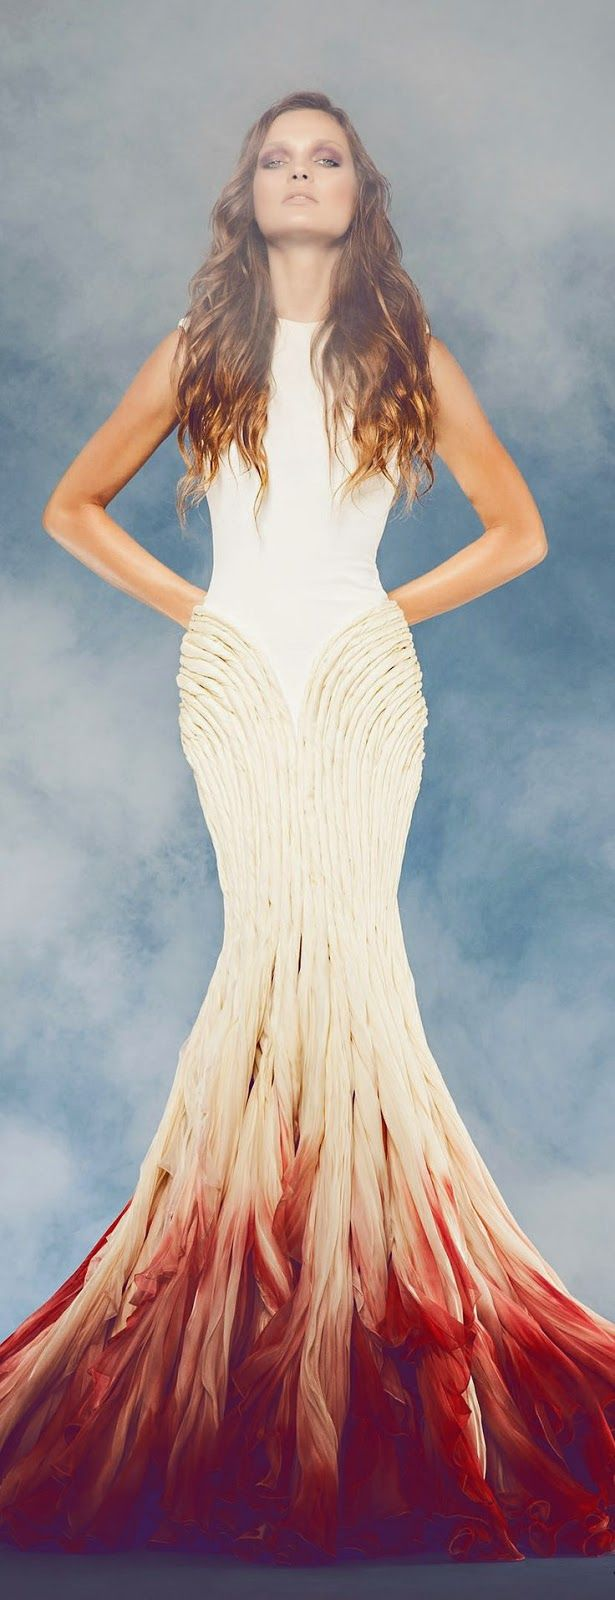 Curating fashion u style elegance aries pinterest fashion